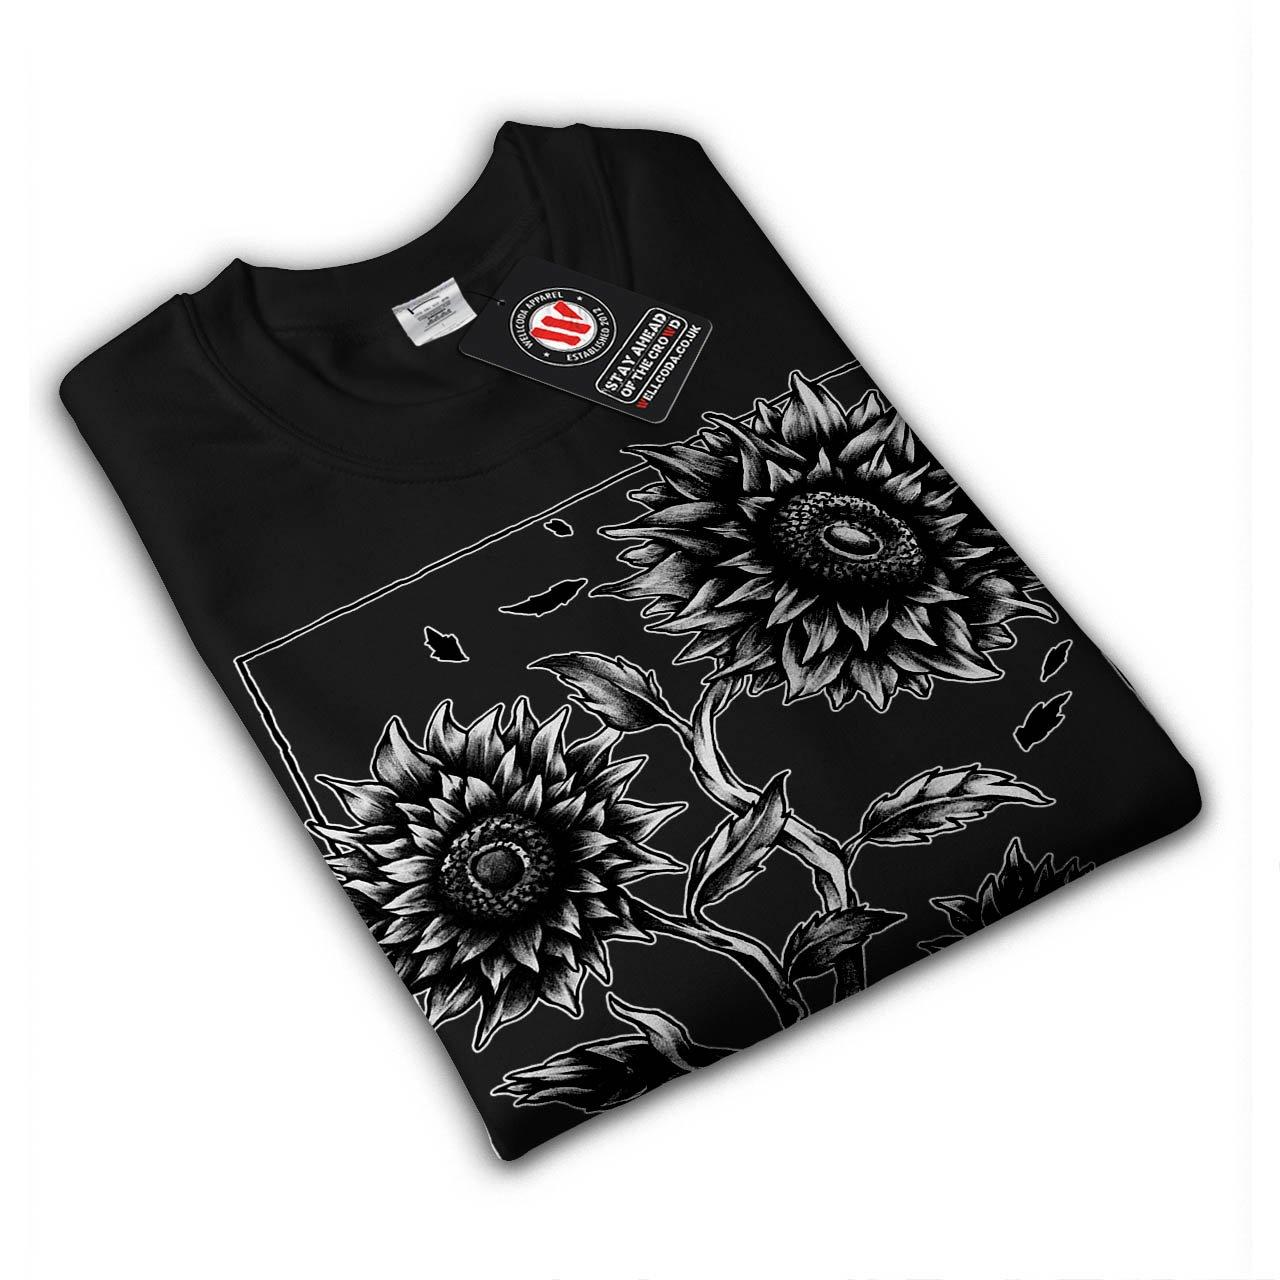 Helianthus Top Pullover Jumper Wellcoda Sunflower Mens Sweatshirt